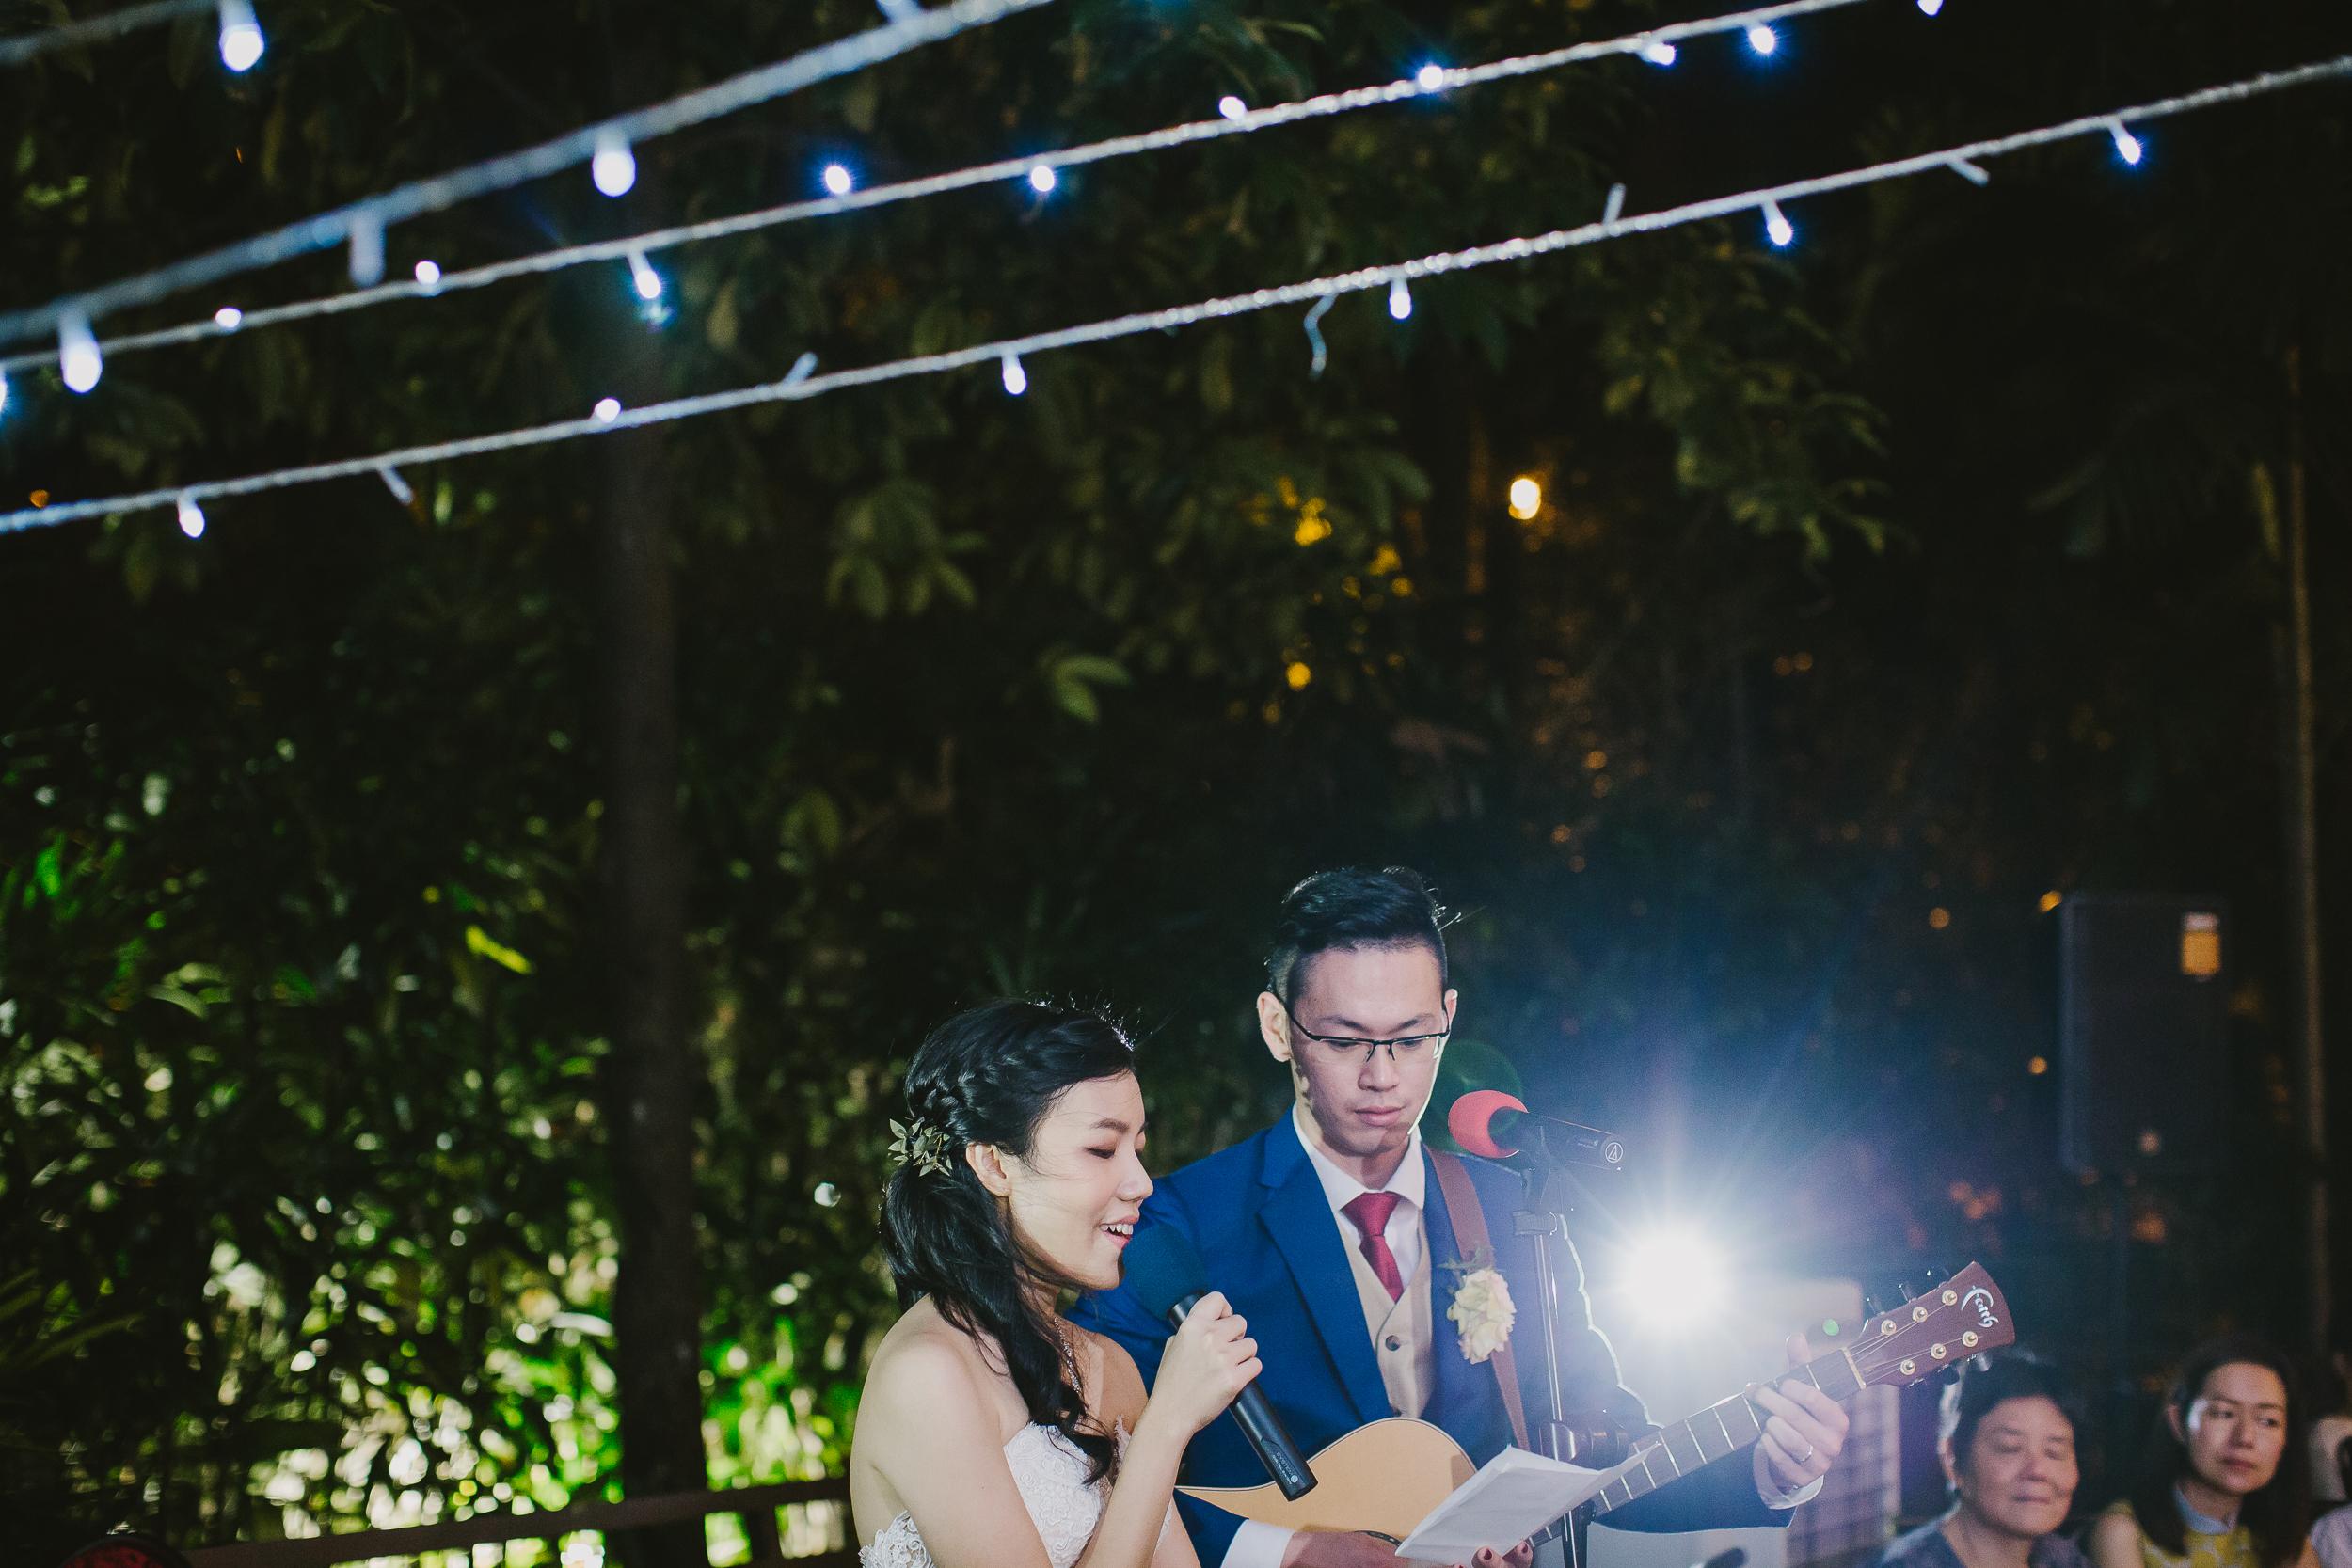 Singapore+Actual+Day+Wedding+Photographer+Min+Jiang+Rochester+Gareth+Faith--0072.jpg